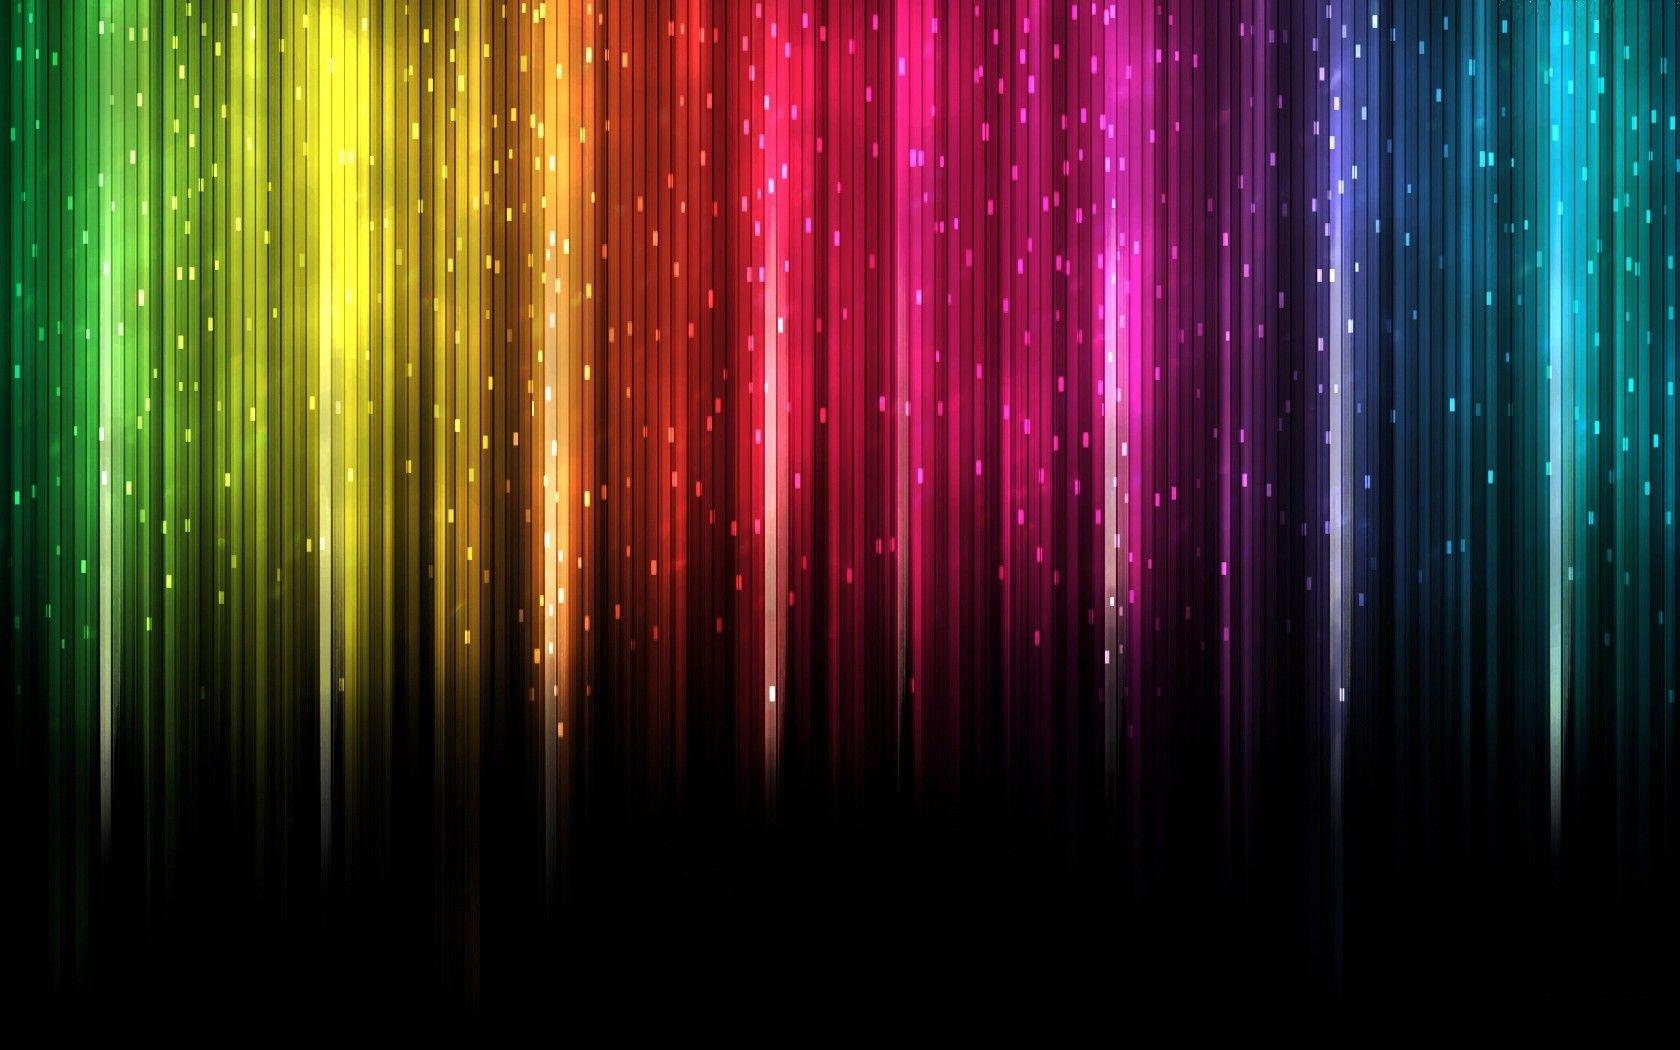 Wallpapers Colors Electrizante Pentru Vibrant Electrical 1680x1050 1680x1050